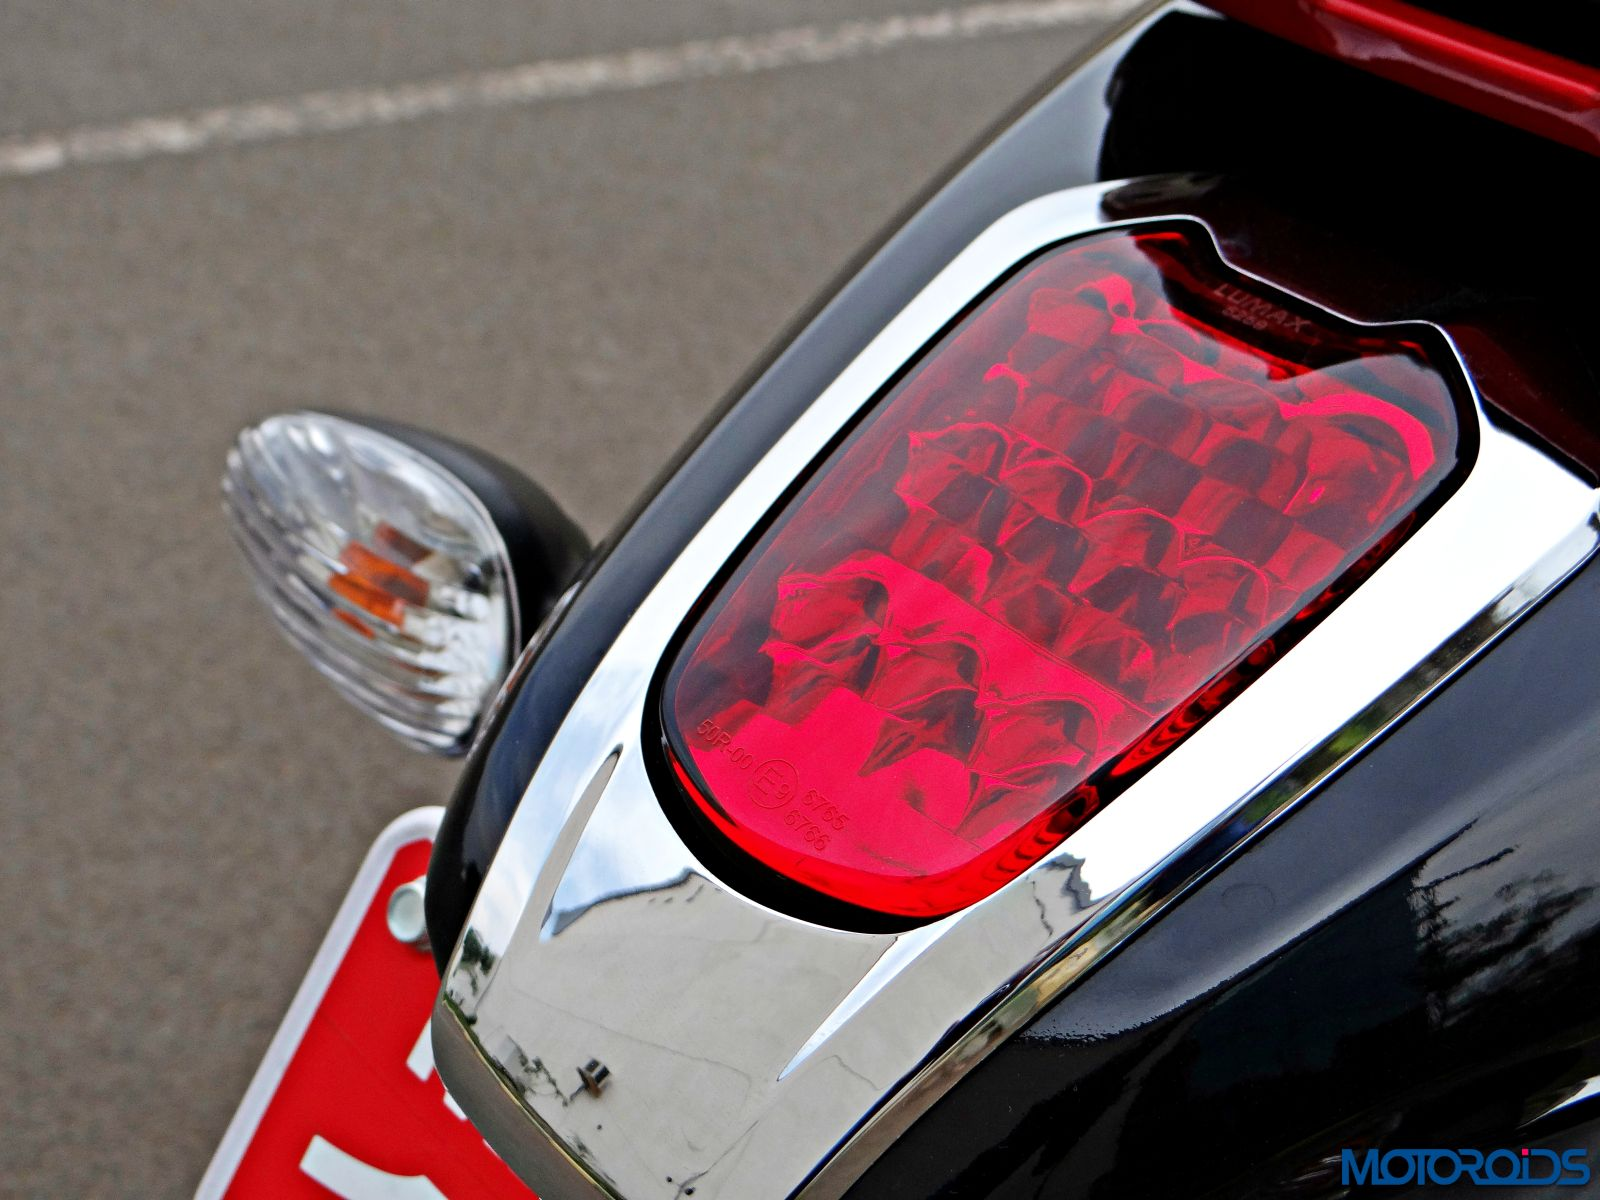 Bajaj V15 - Review - Details - Tail Light (2)